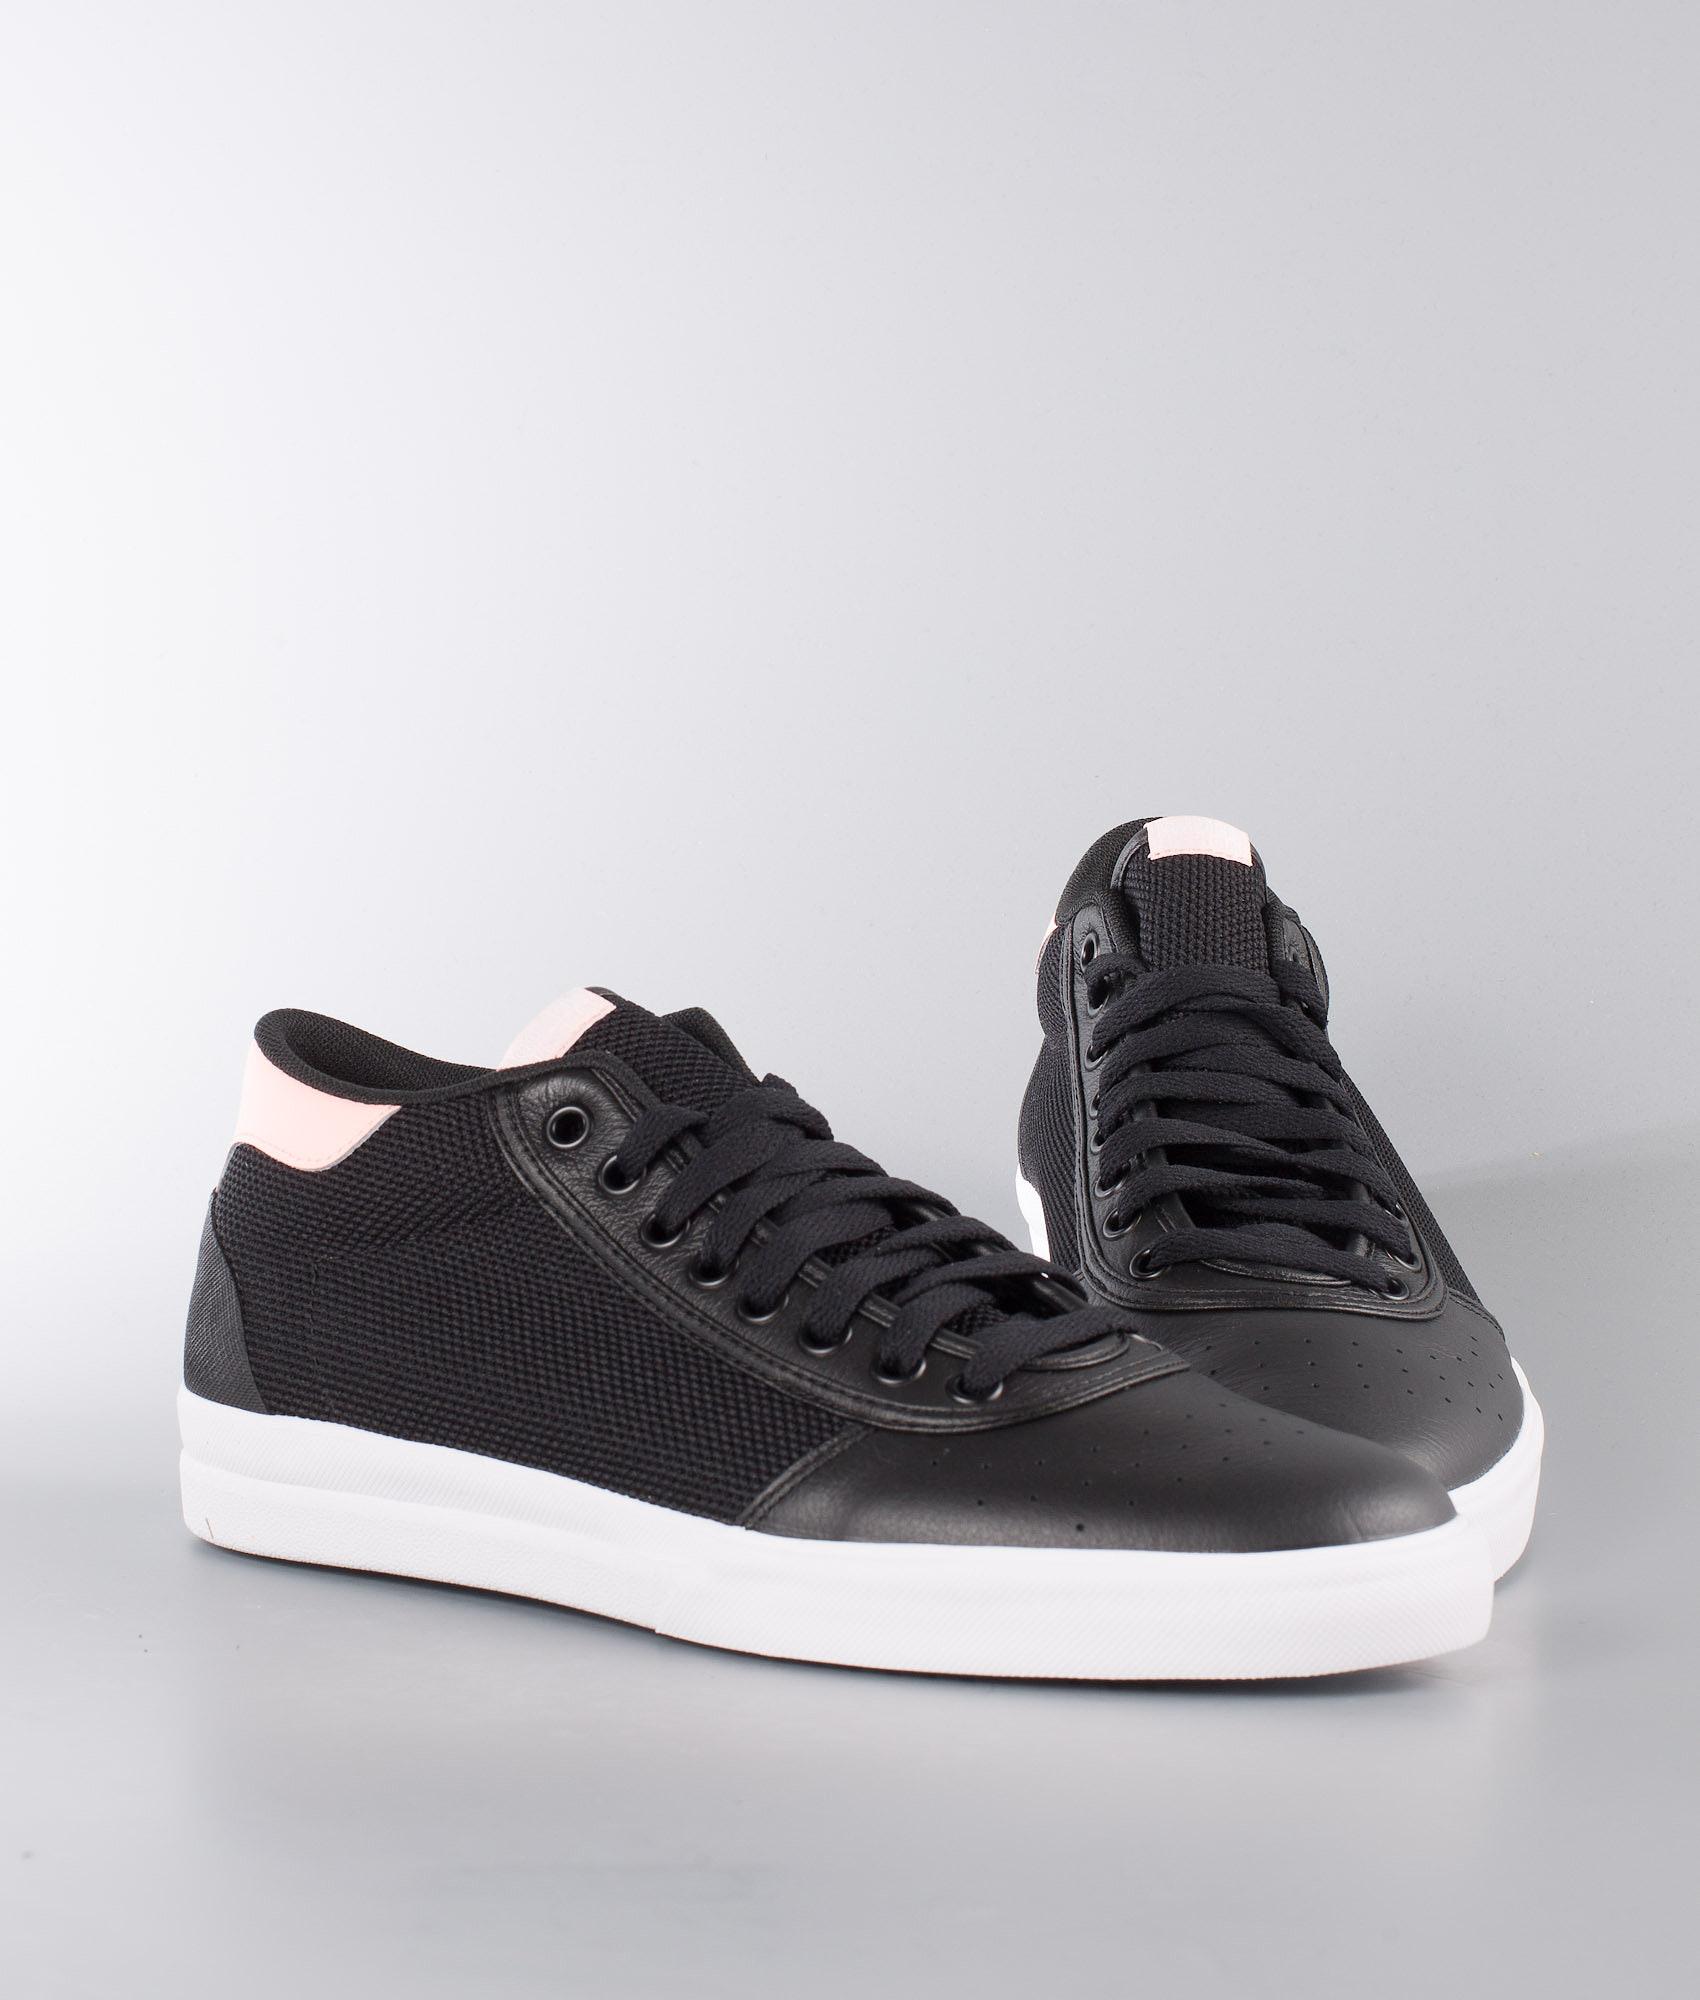 6a025eca9dbf9 Adidas Skateboarding Lucas Premiere Mid Shoes Core Black/Ftwr White/Hazcor